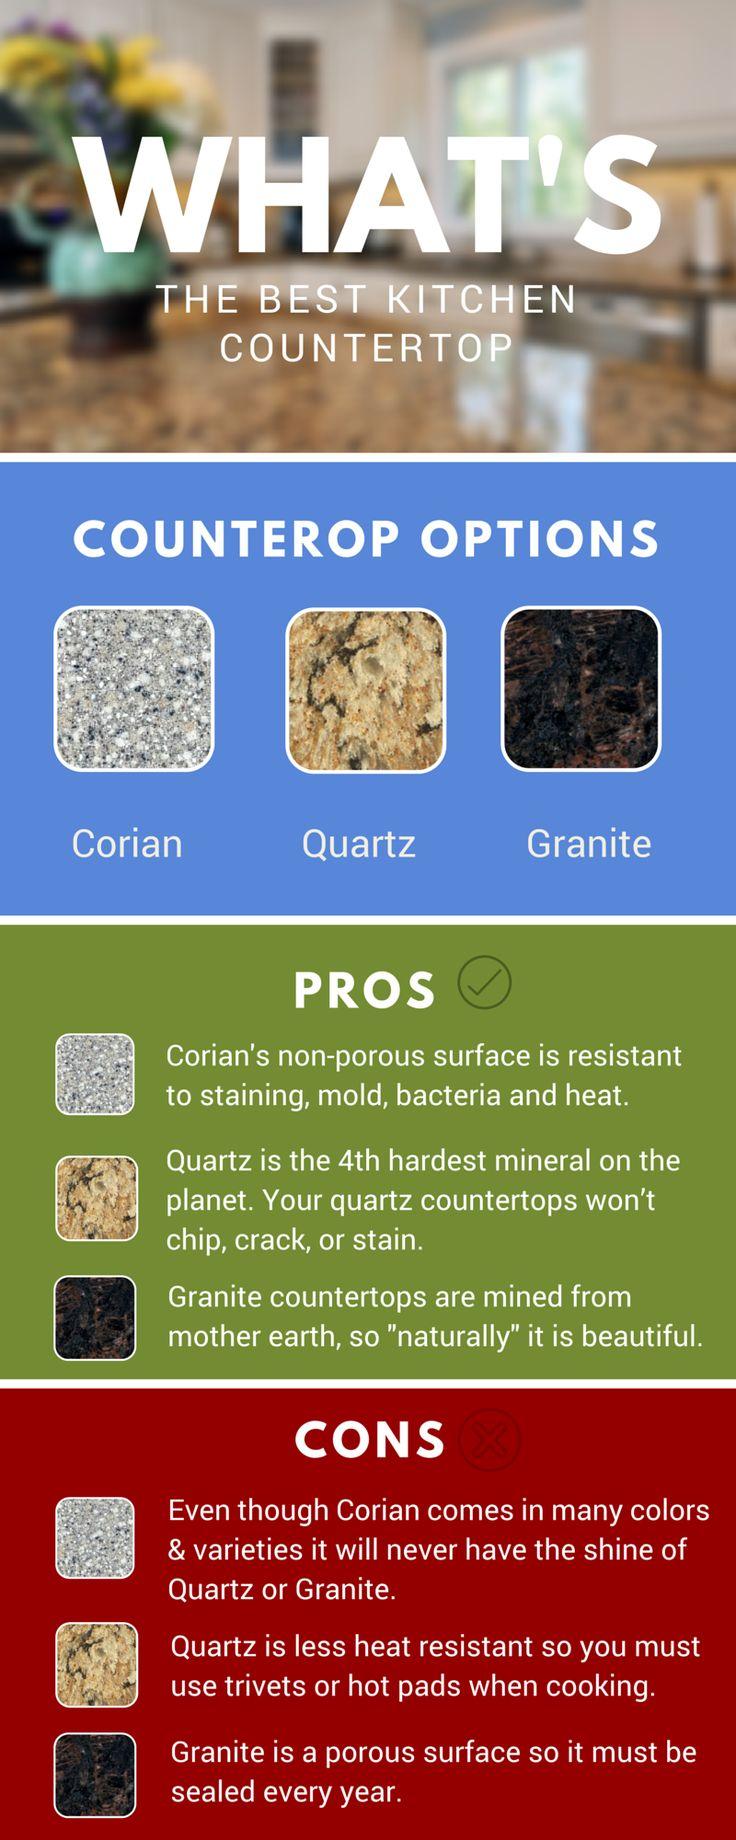 corian countertops best countertops for kitchen What s the Best Kitchen Countertop Corian Quartz or Granite